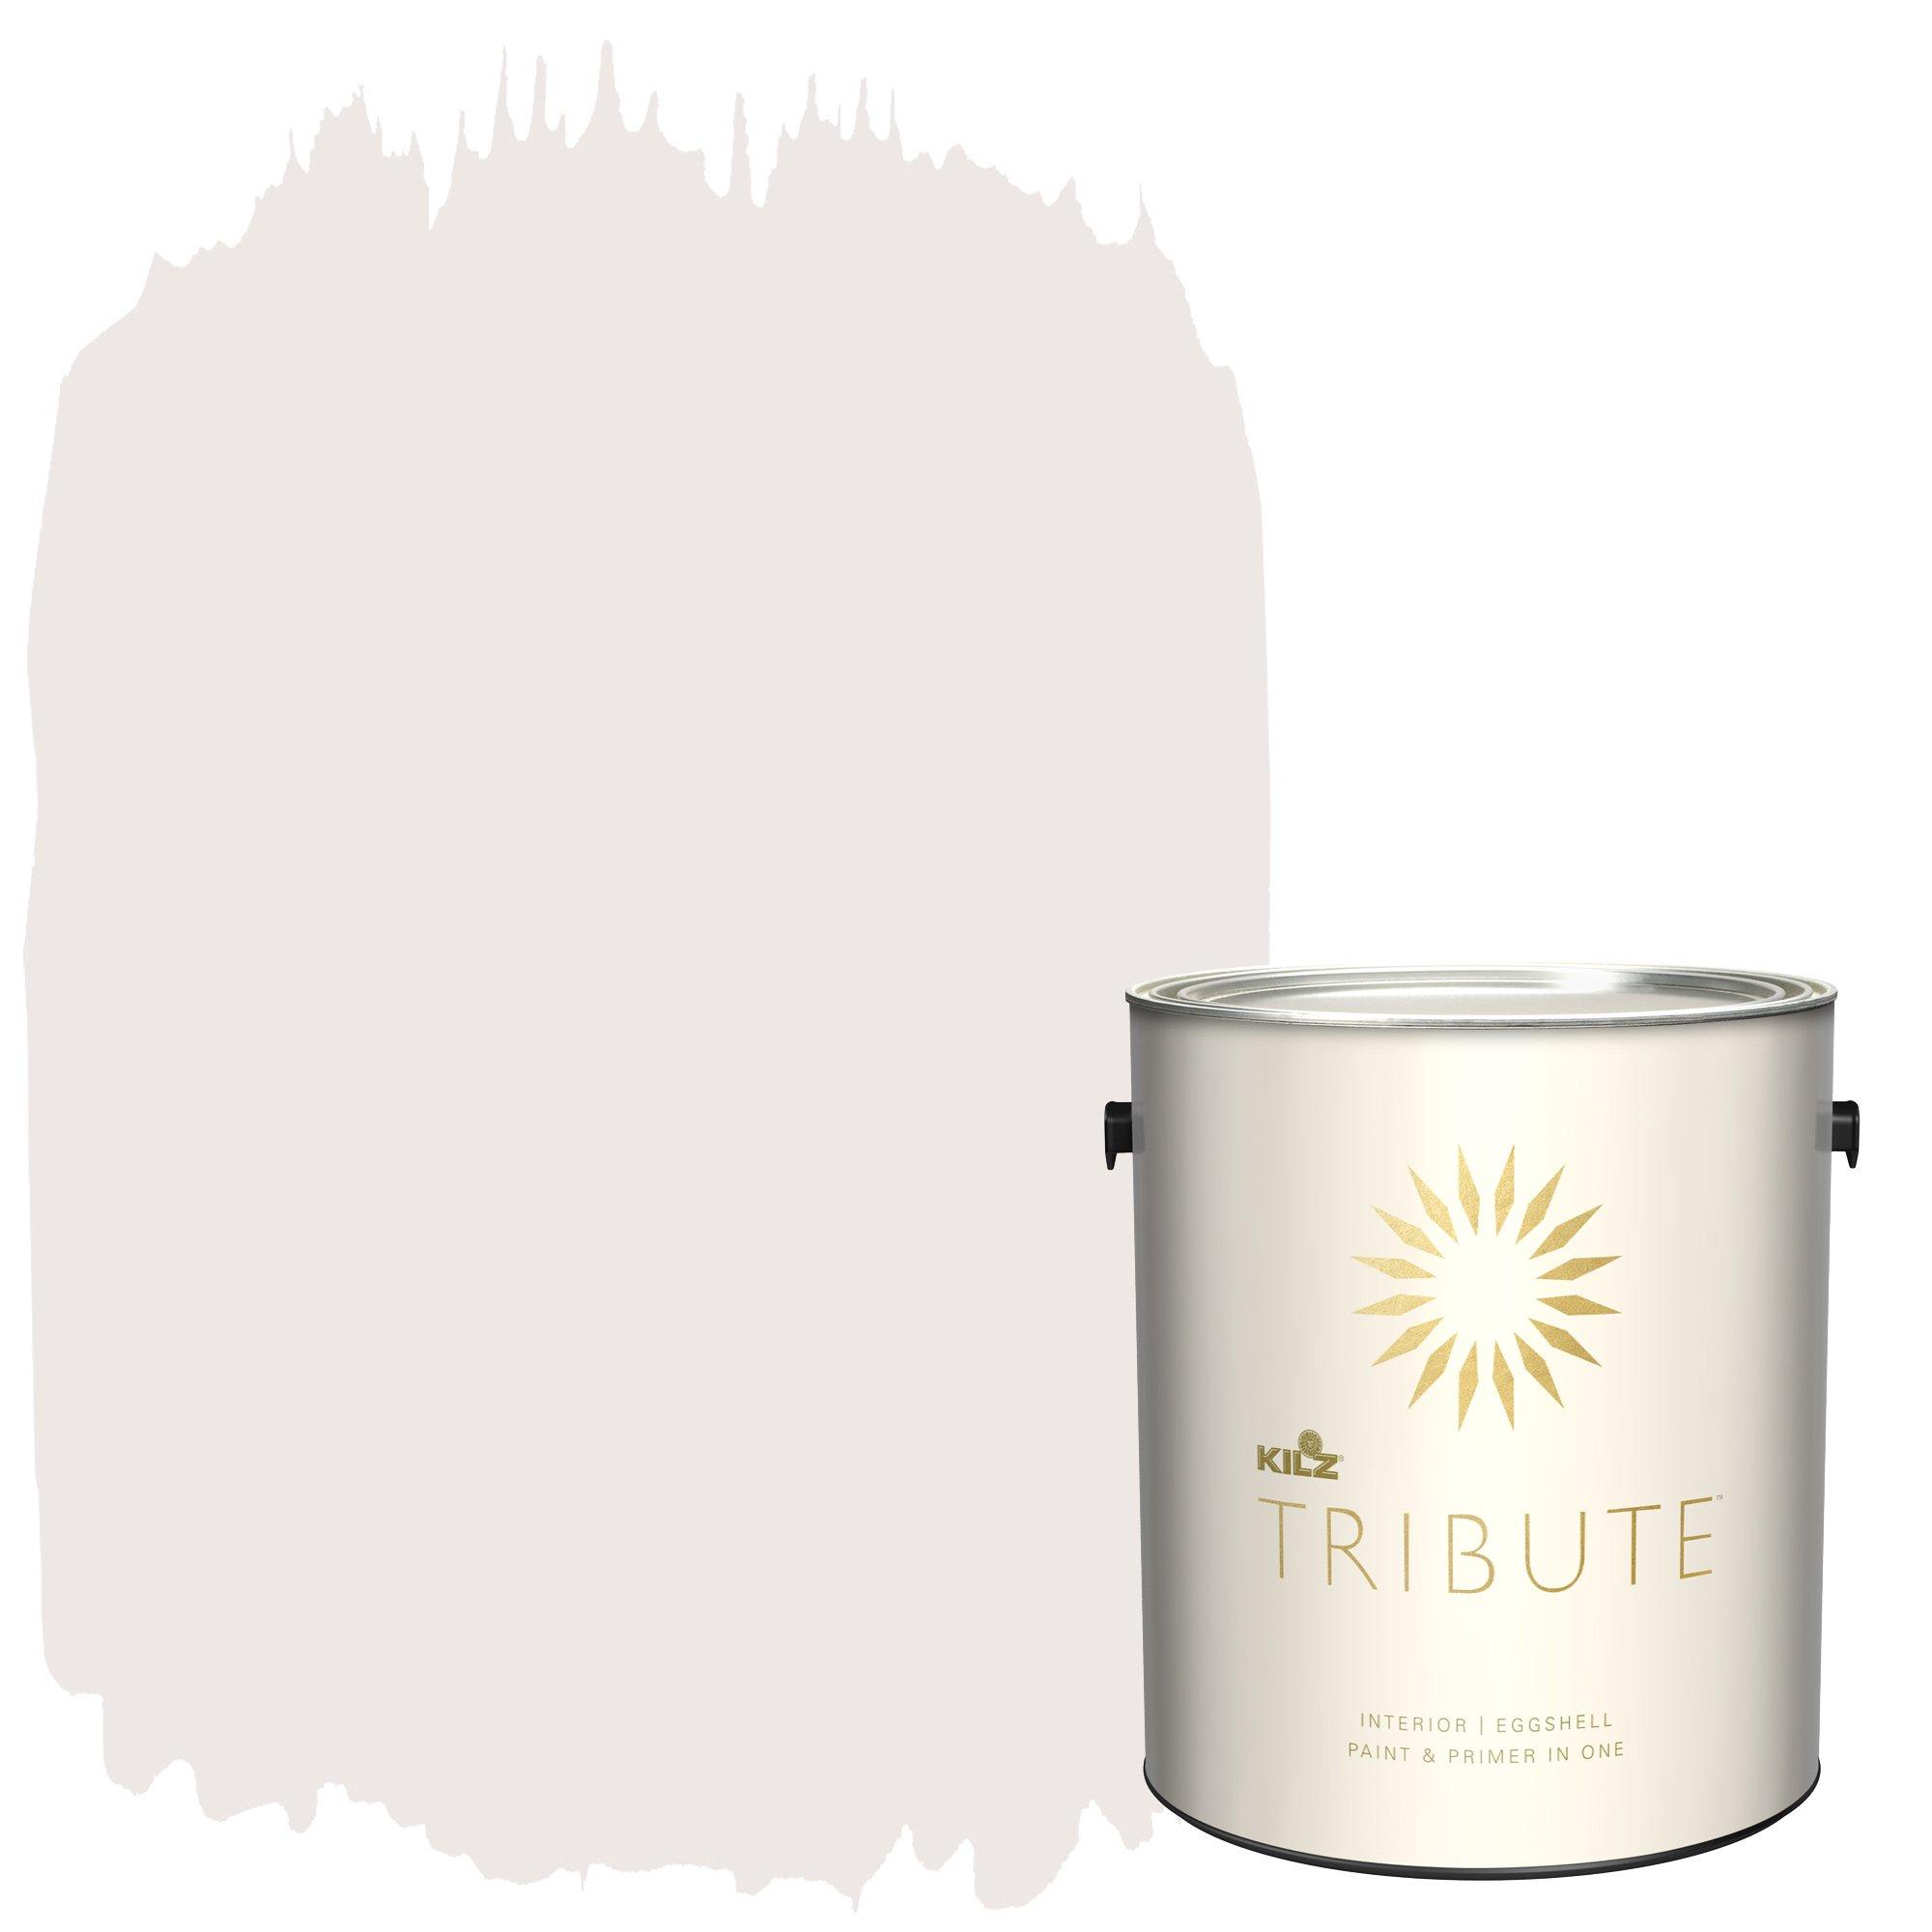 KILZ TRIBUTE Interior Eggshell Paint and Primer in One, 1 Gallon, Blushing White (TB-21)